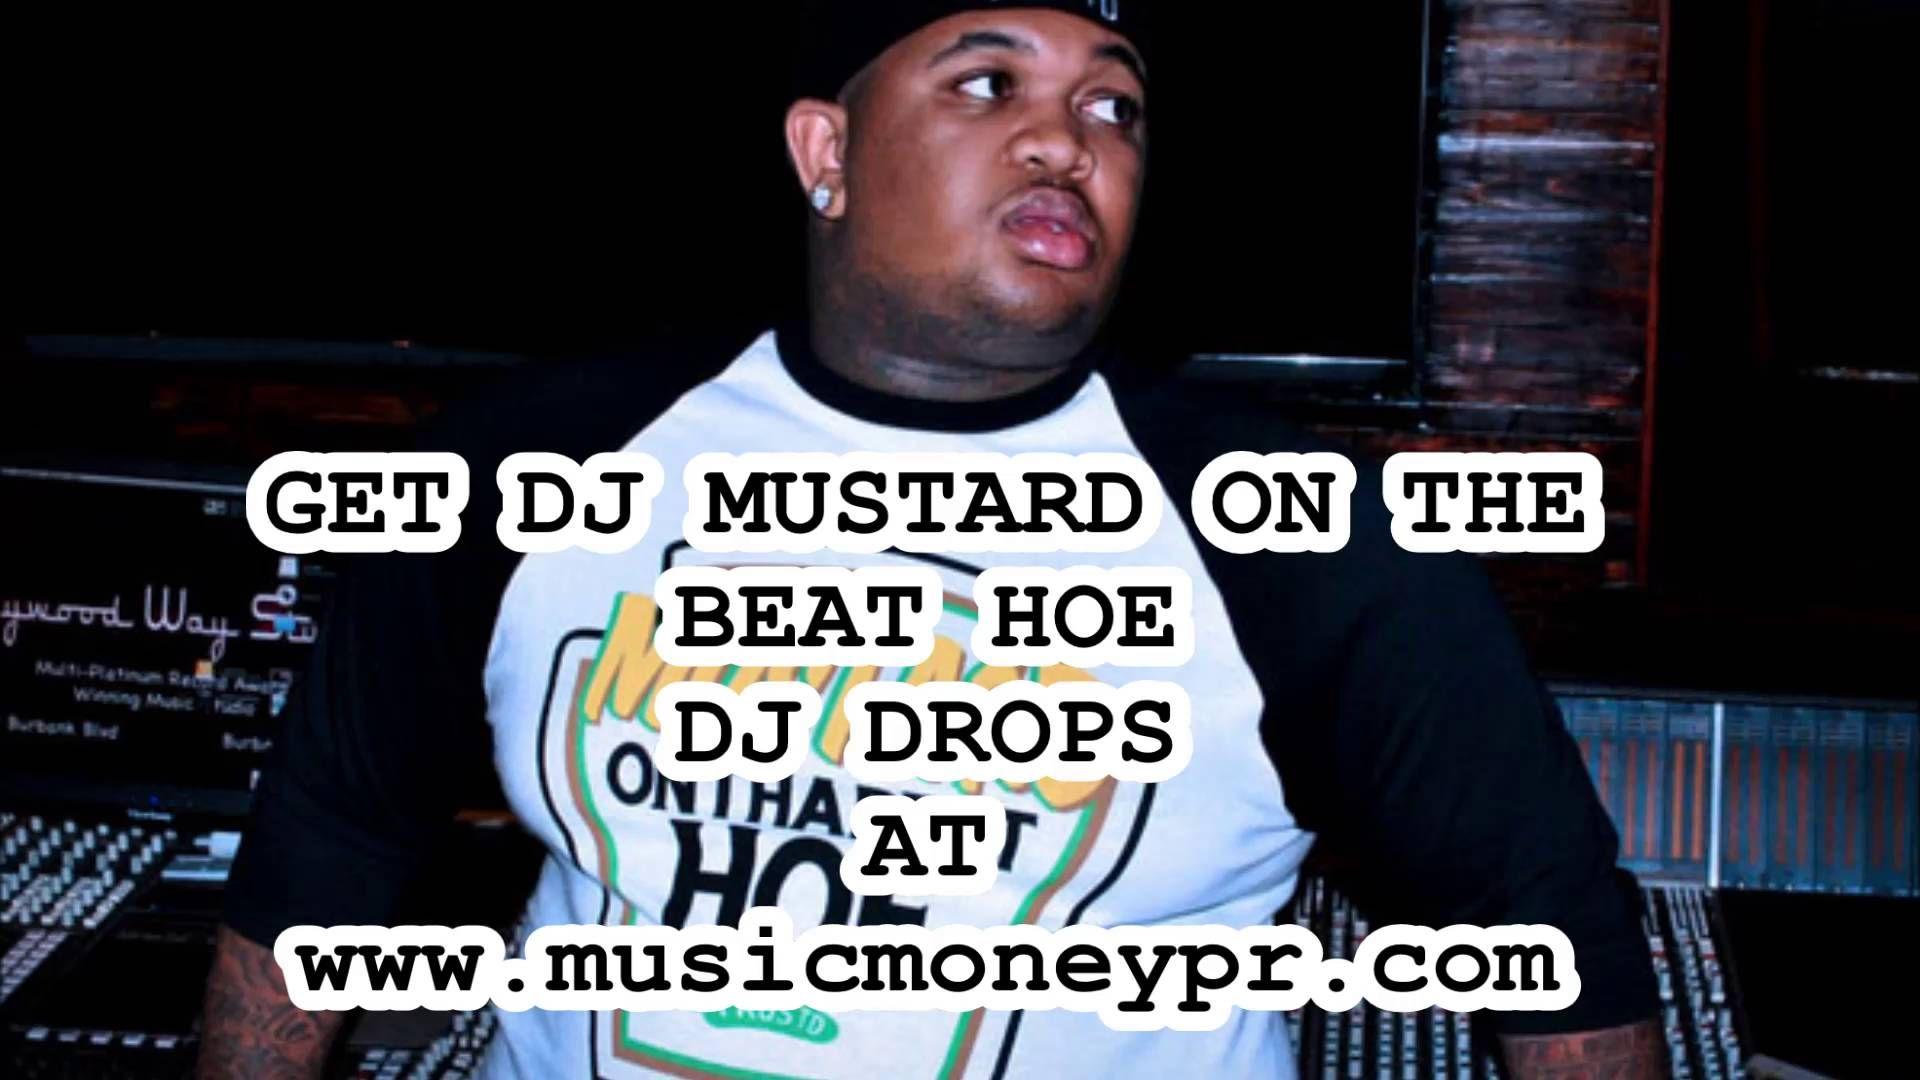 MUSTARD ON THE BEAT HOE CUSTOM DJ DROPS | custom dj drops | Drop